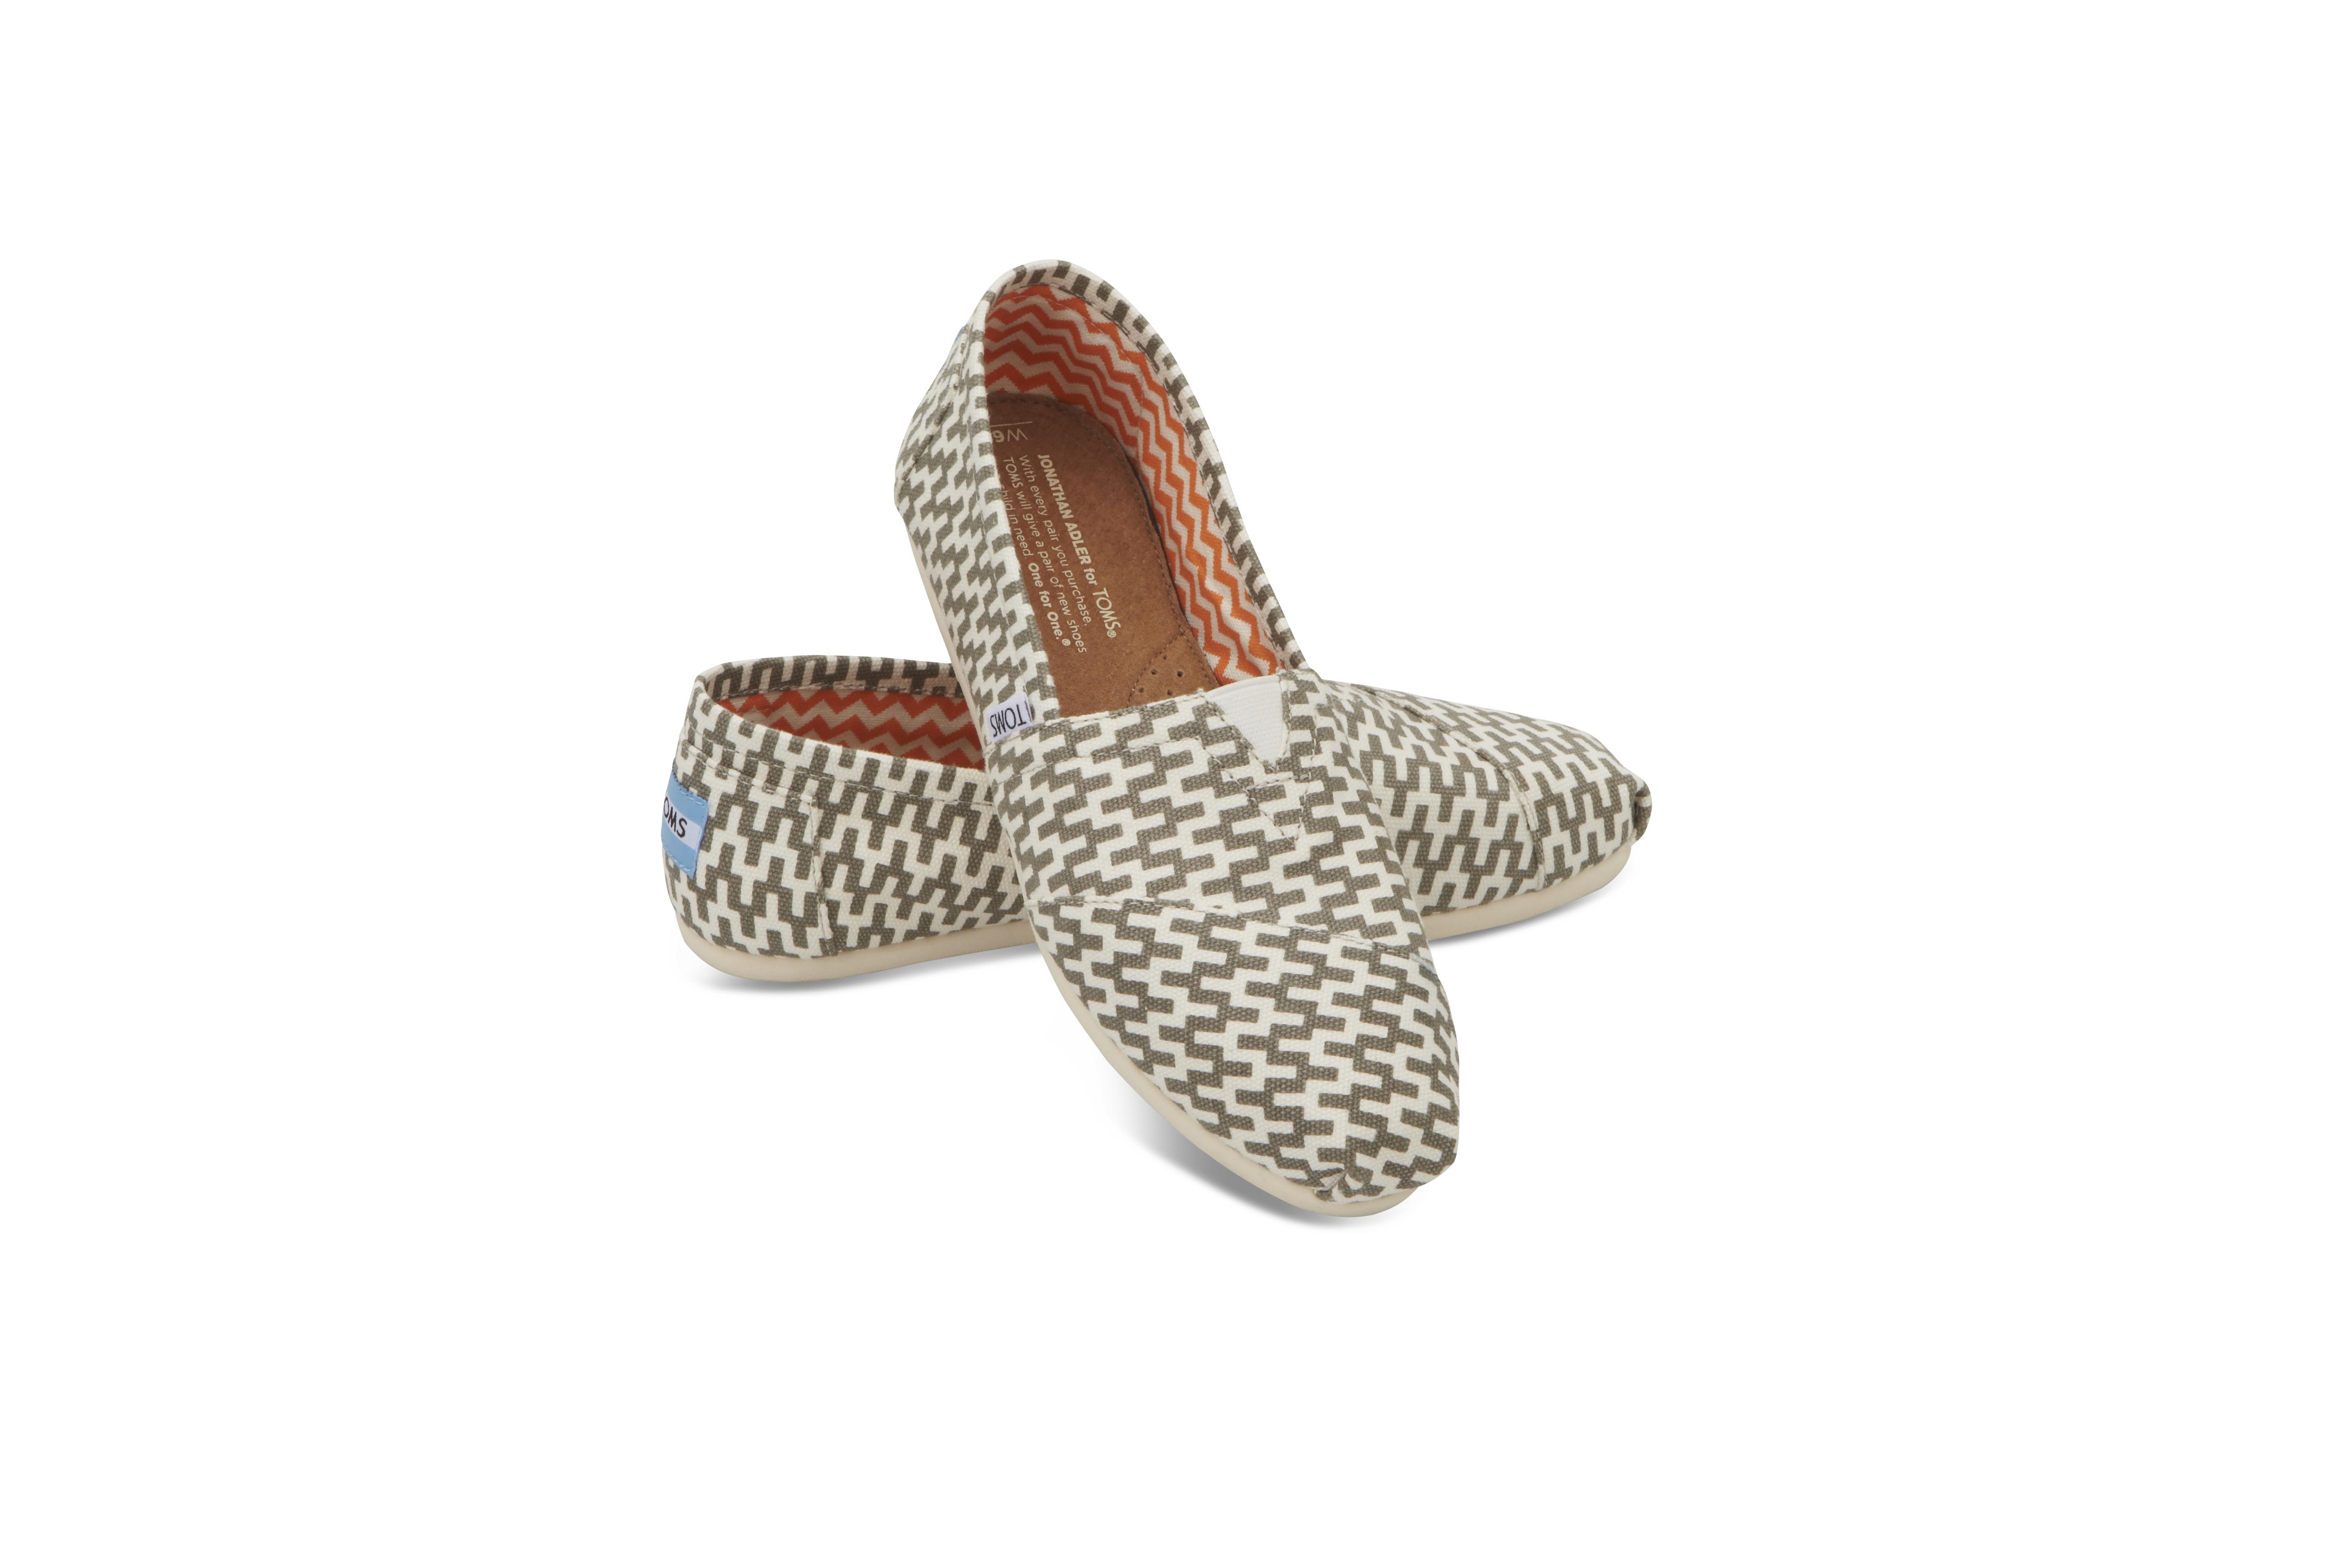 TOMS x Jonathan Adler Spring 2014 shoe and eyewear collections, spring trends 2014, jonathan adler